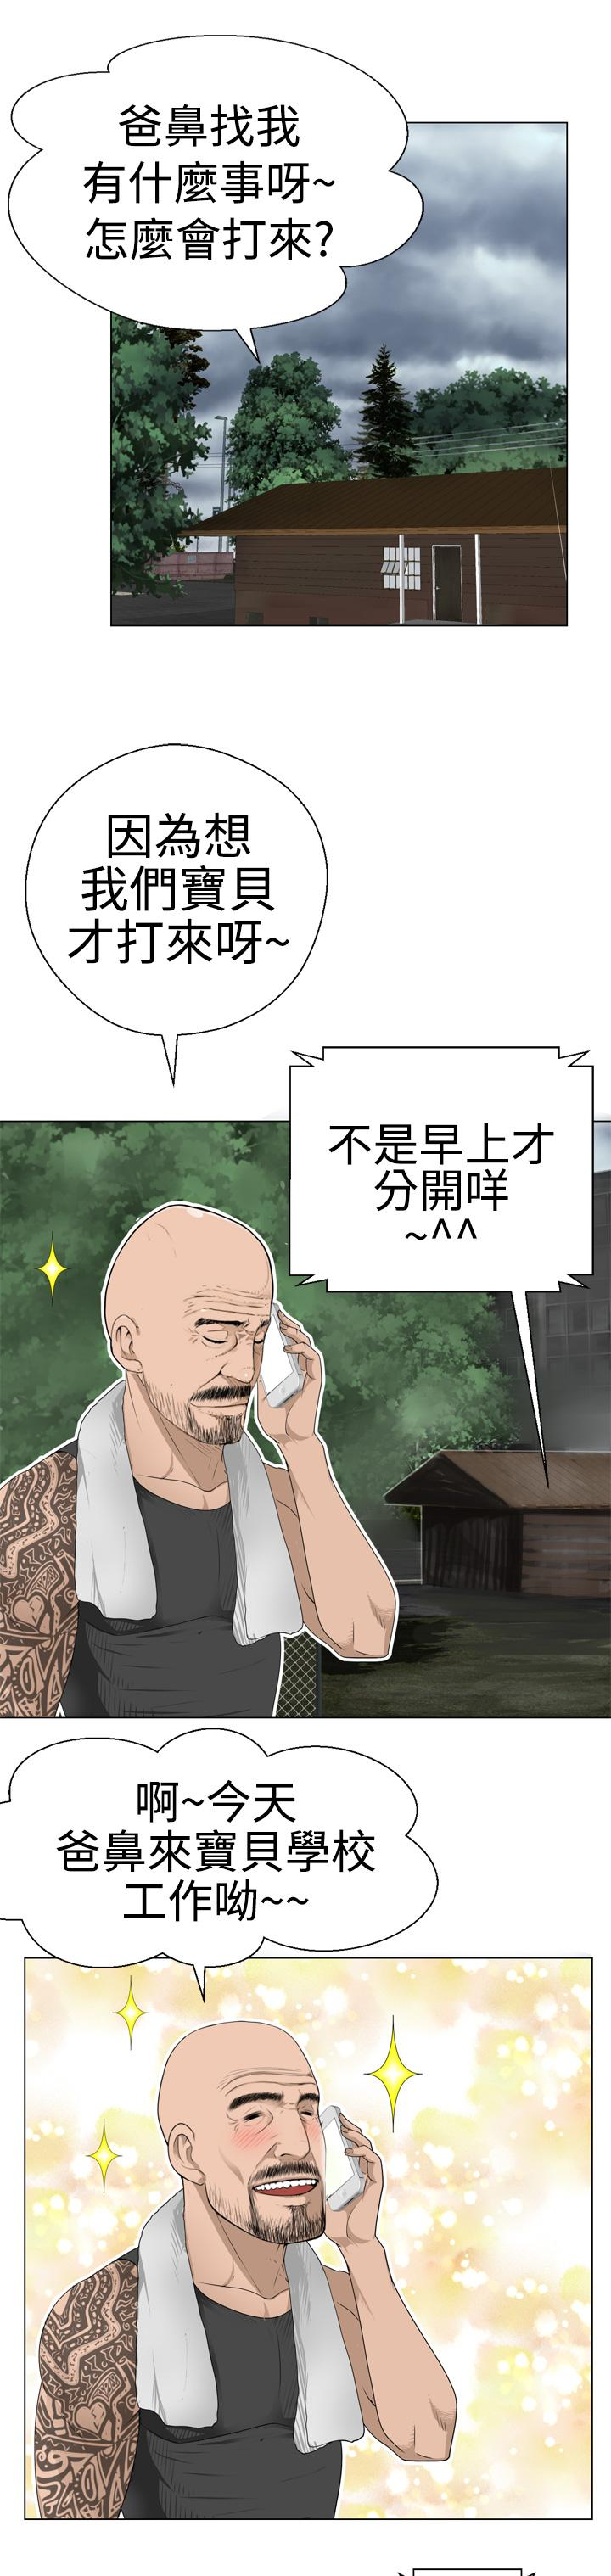 [SOSO] Franken Jo 为爱而生 法兰克赵 Ch.1~19 [Chinese]中文 152